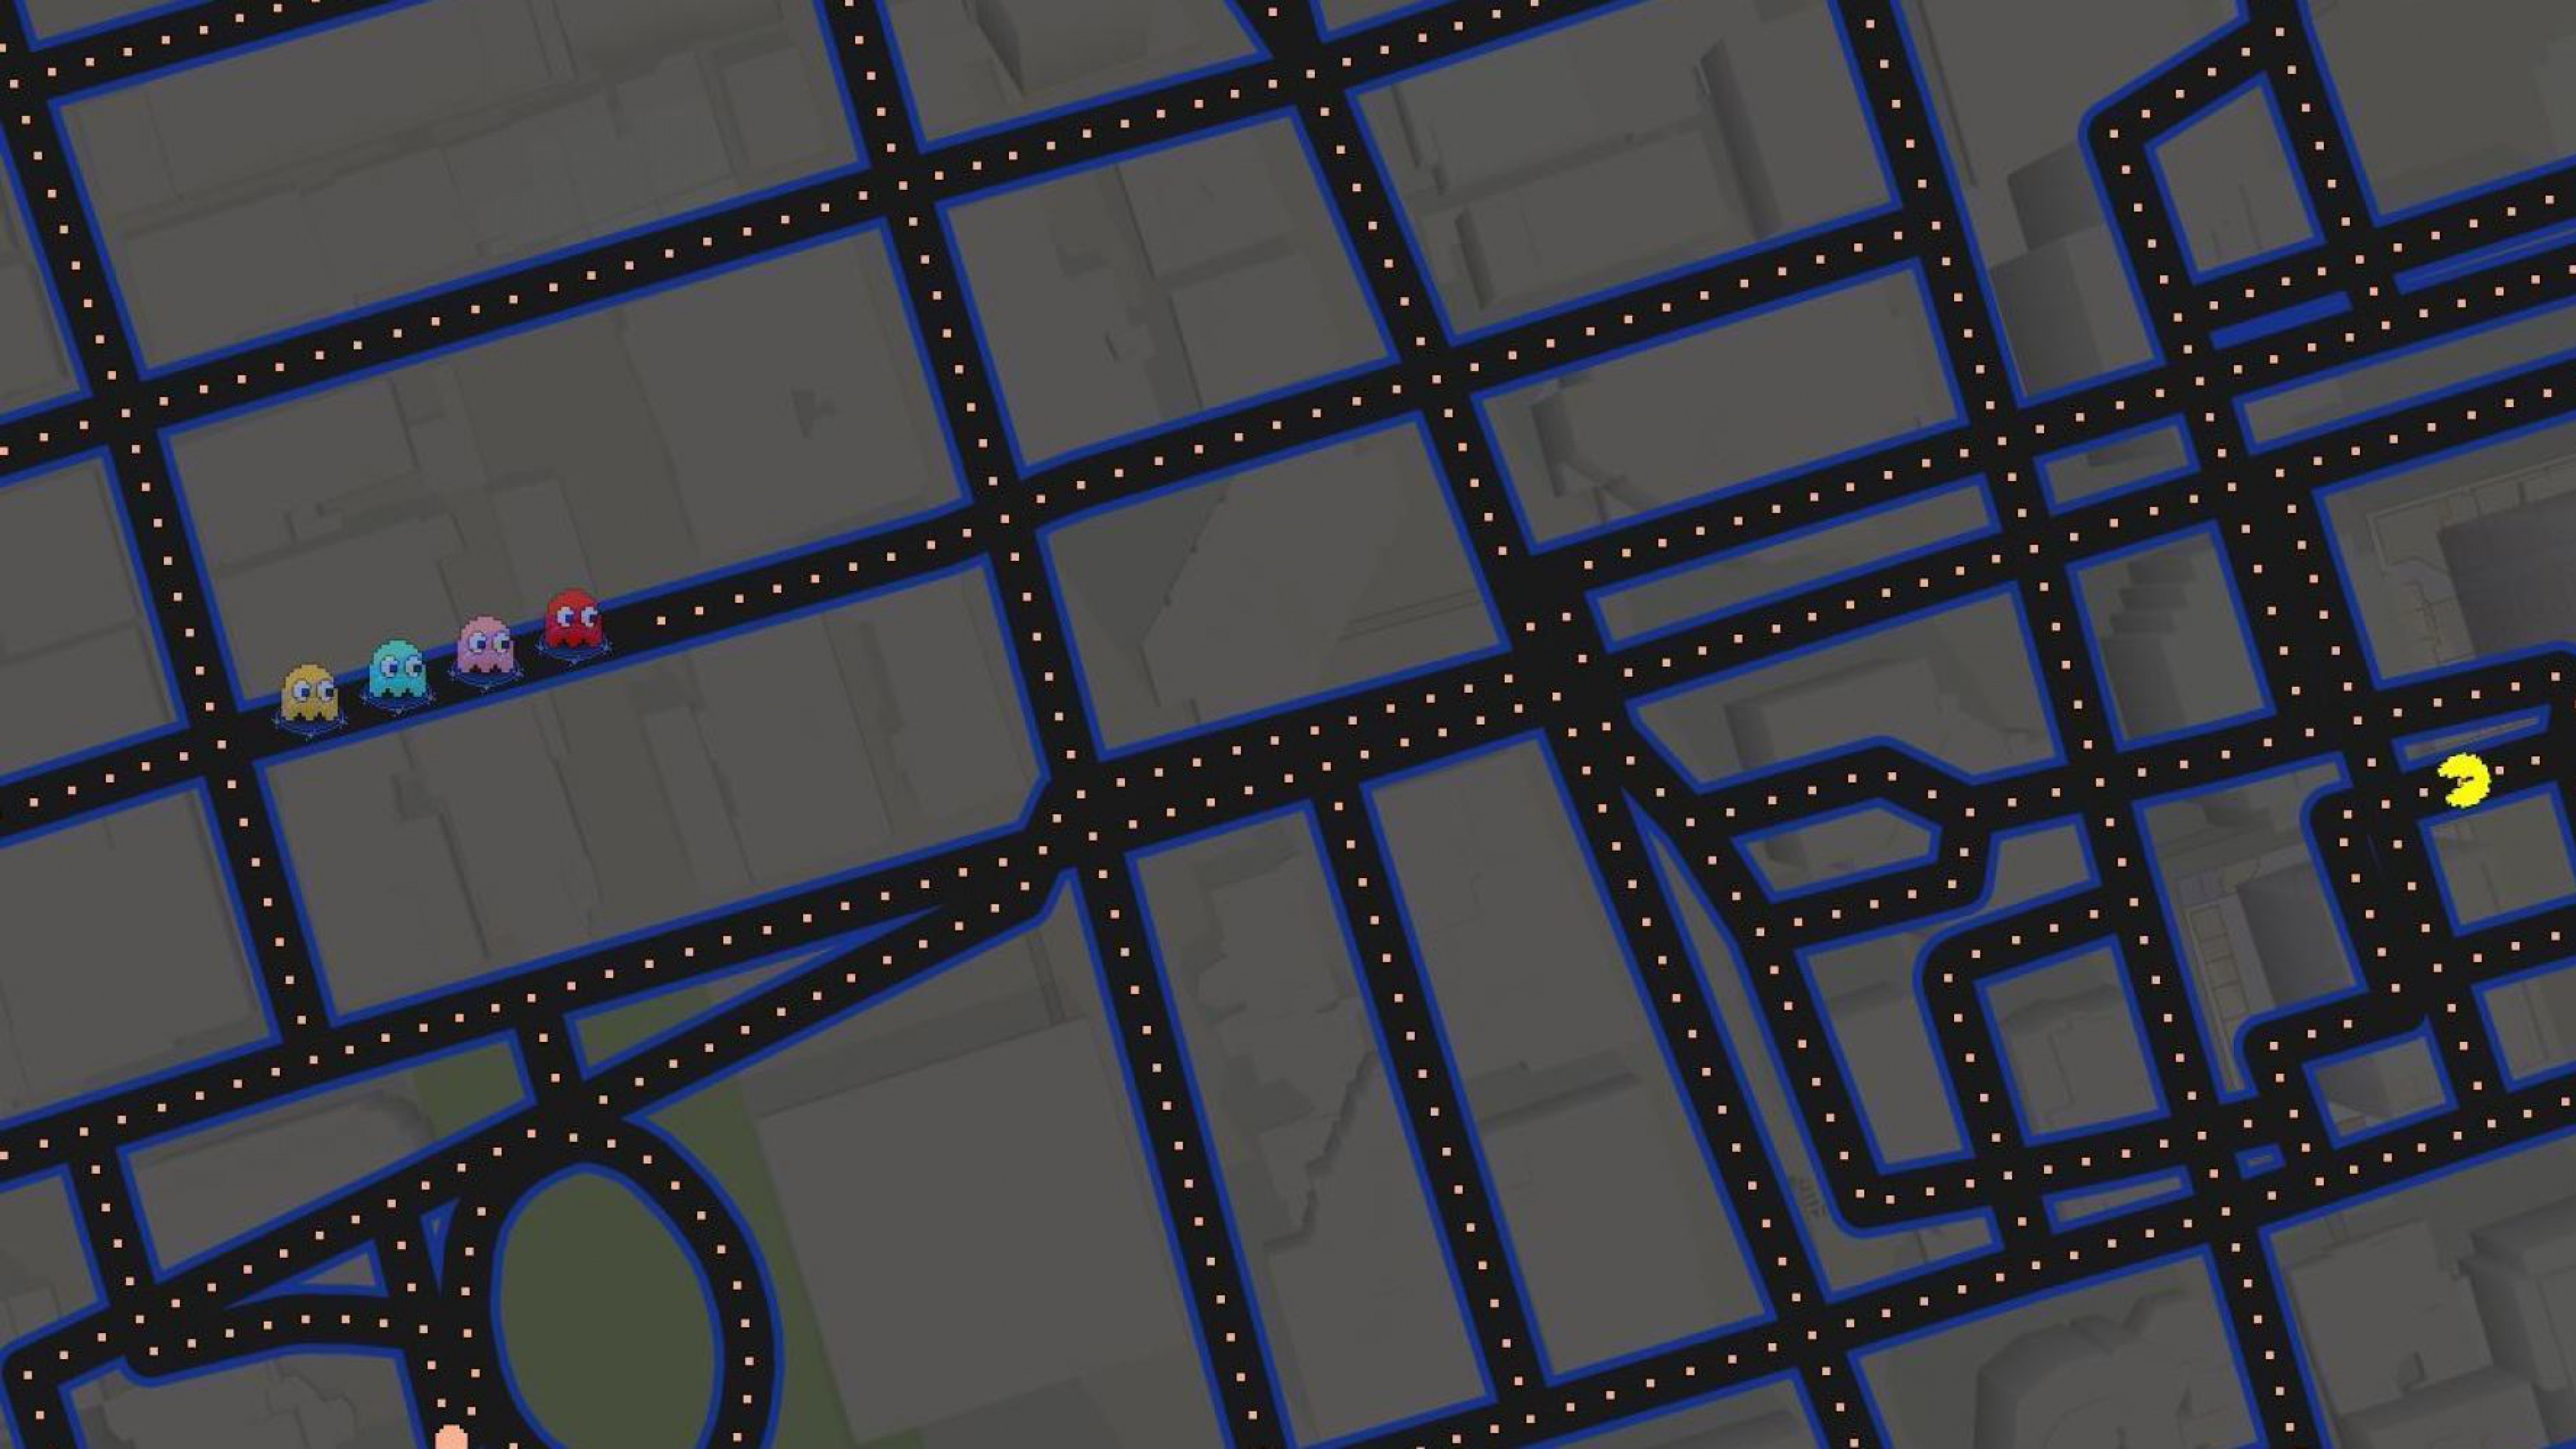 google maps pacman art 4k 1540748311 - Google Maps Pacman Art 4k - pacman wallpapers, google maps wallpapers, digital art wallpapers, art wallpapers